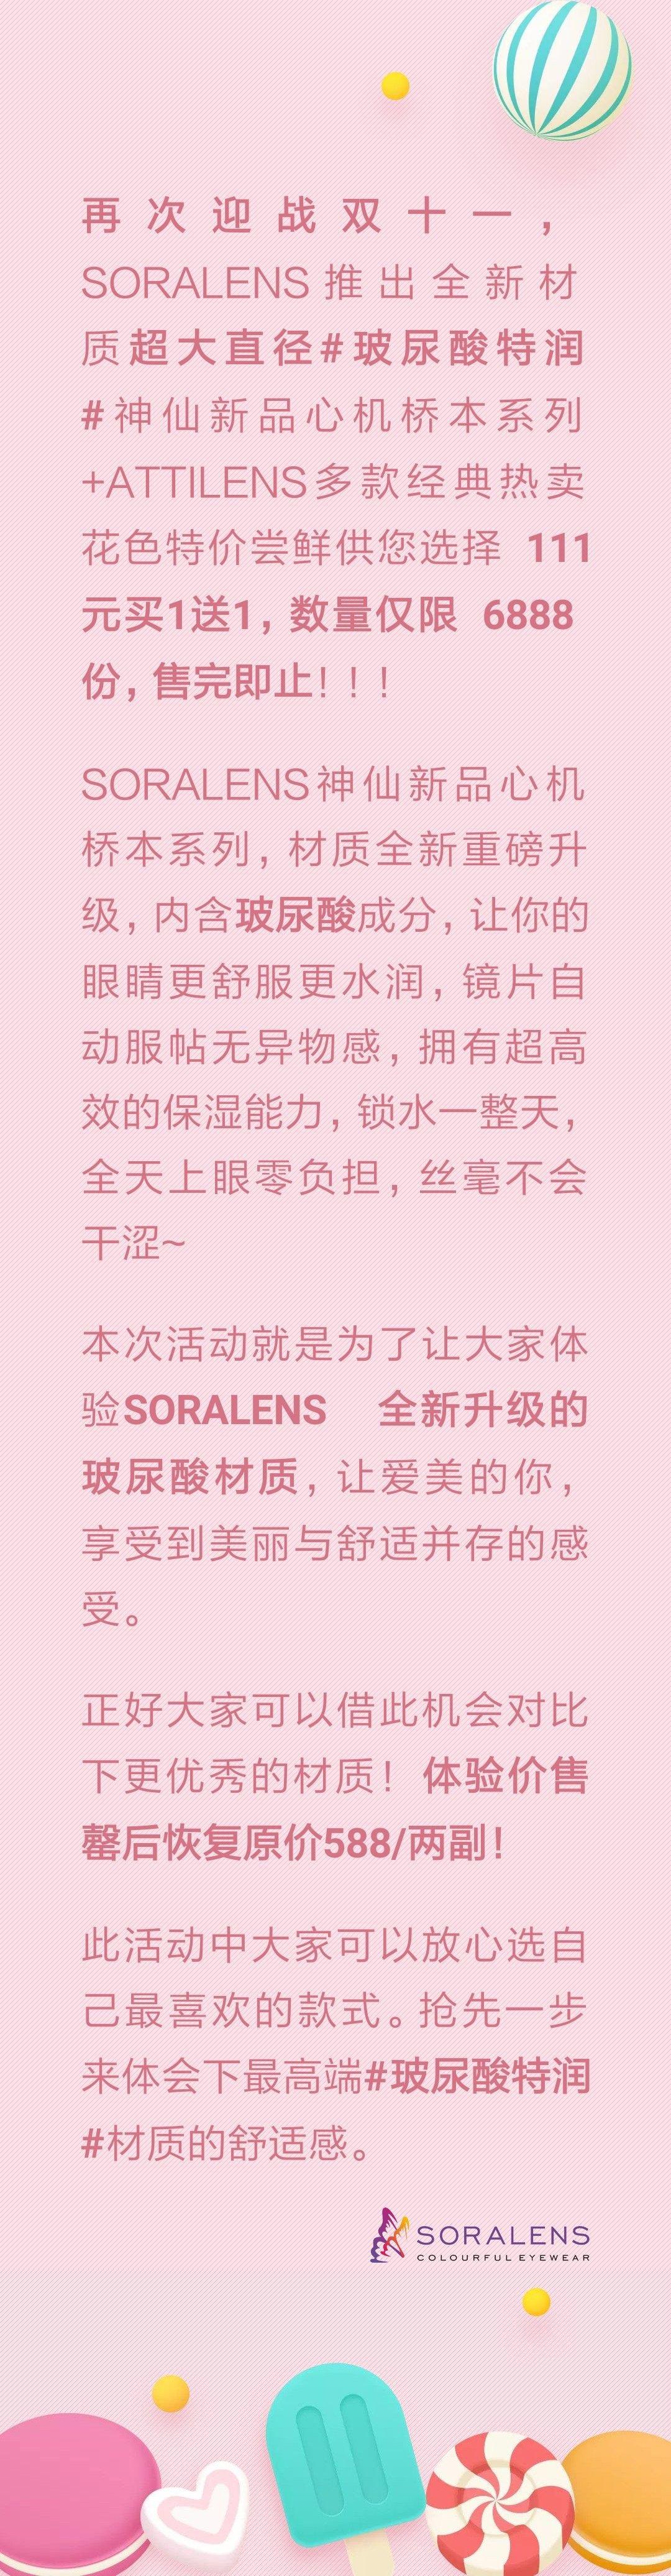 soralens正式💸收购atti黎雾系列快乐加码双十一狂欢第二波正式开始